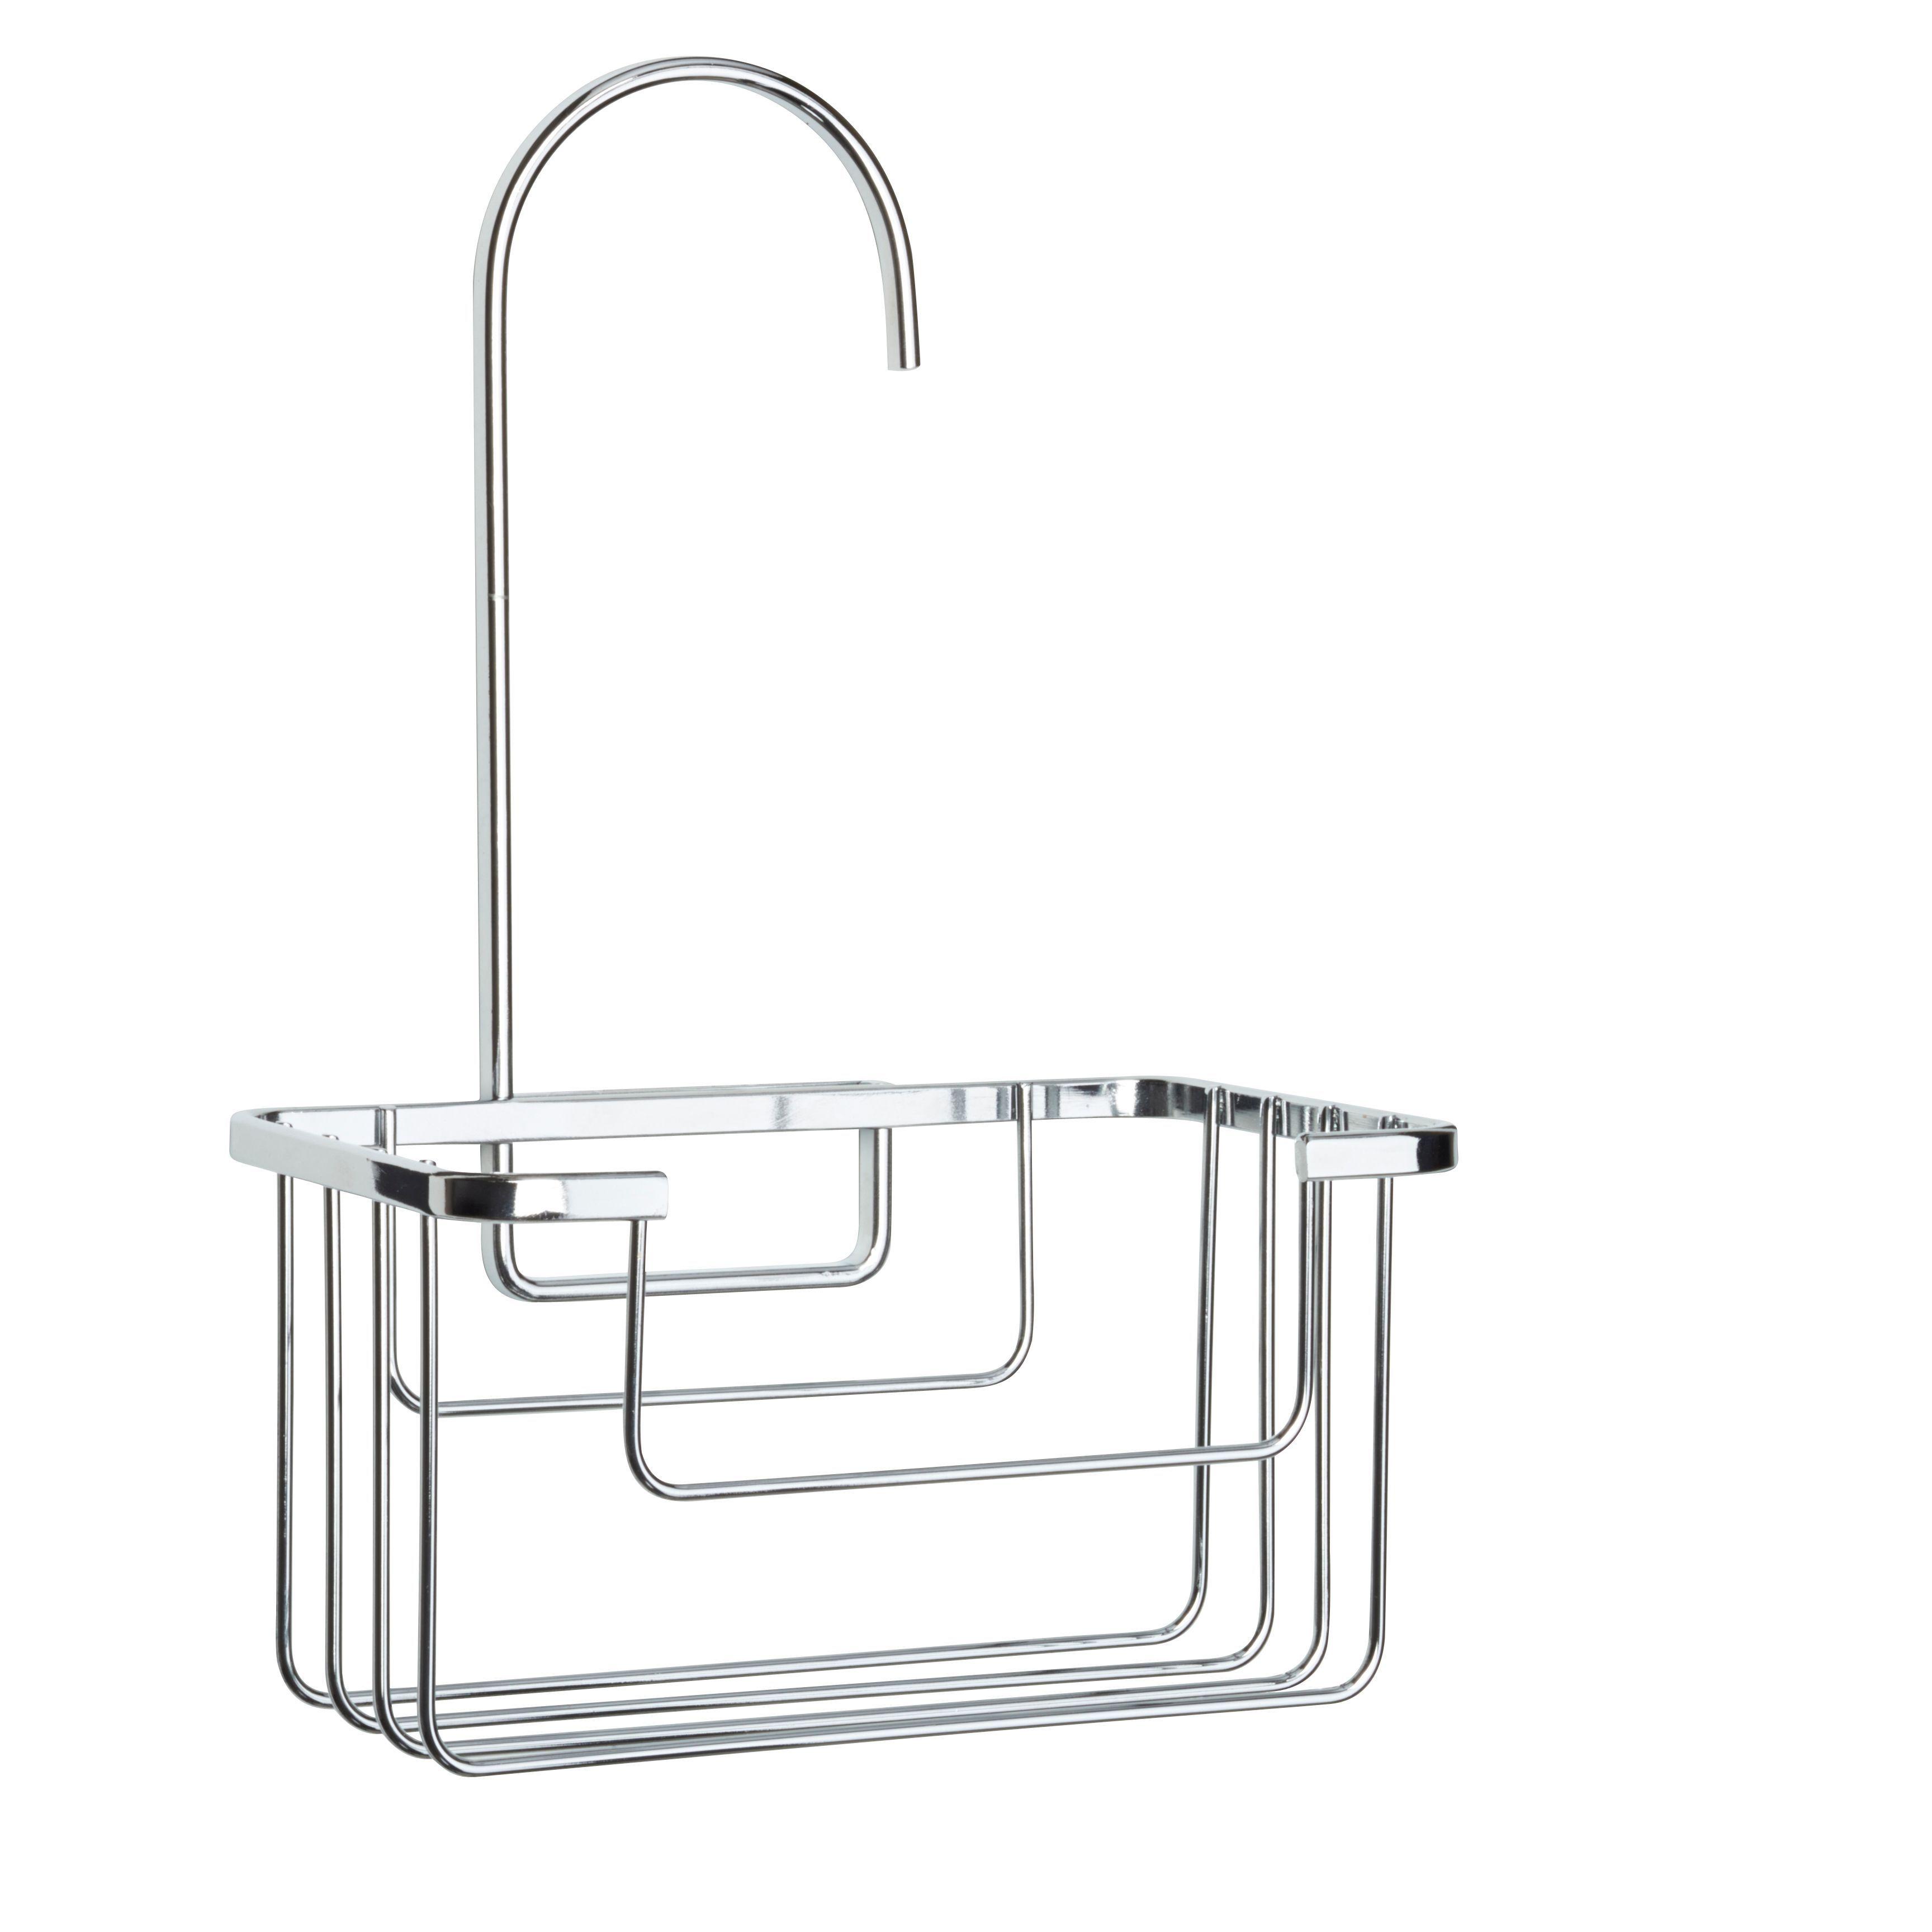 Croydex Chrome effect Mild steel Hook over basket   Pinterest ...